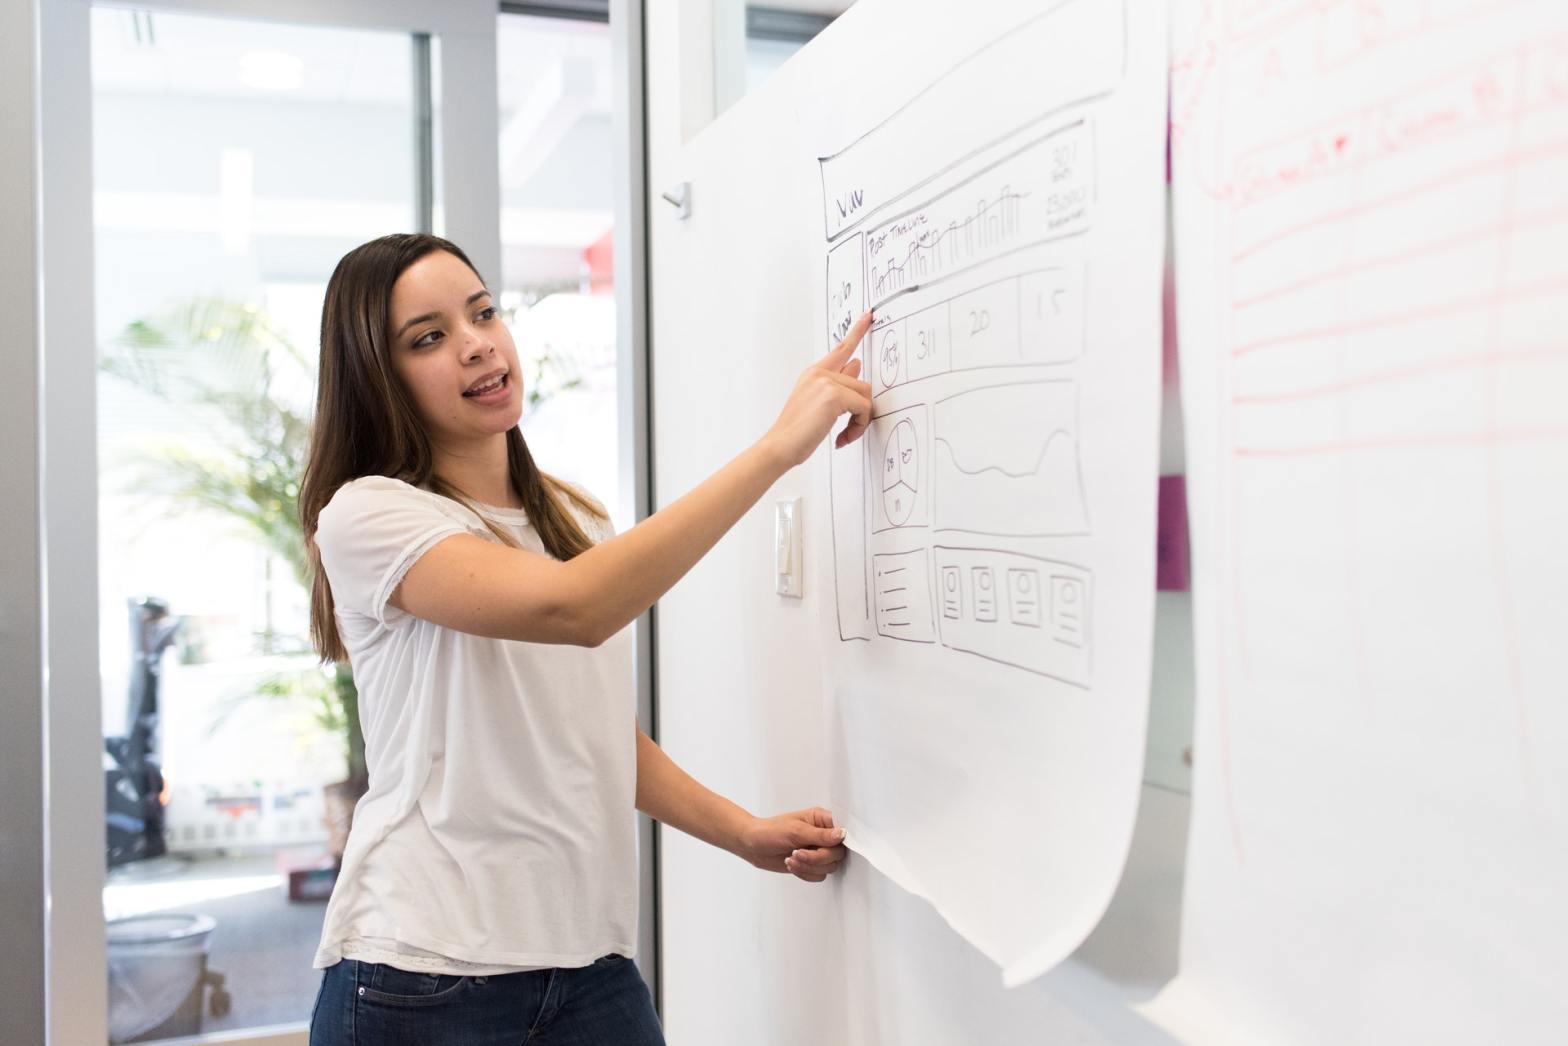 woman at whiteboard